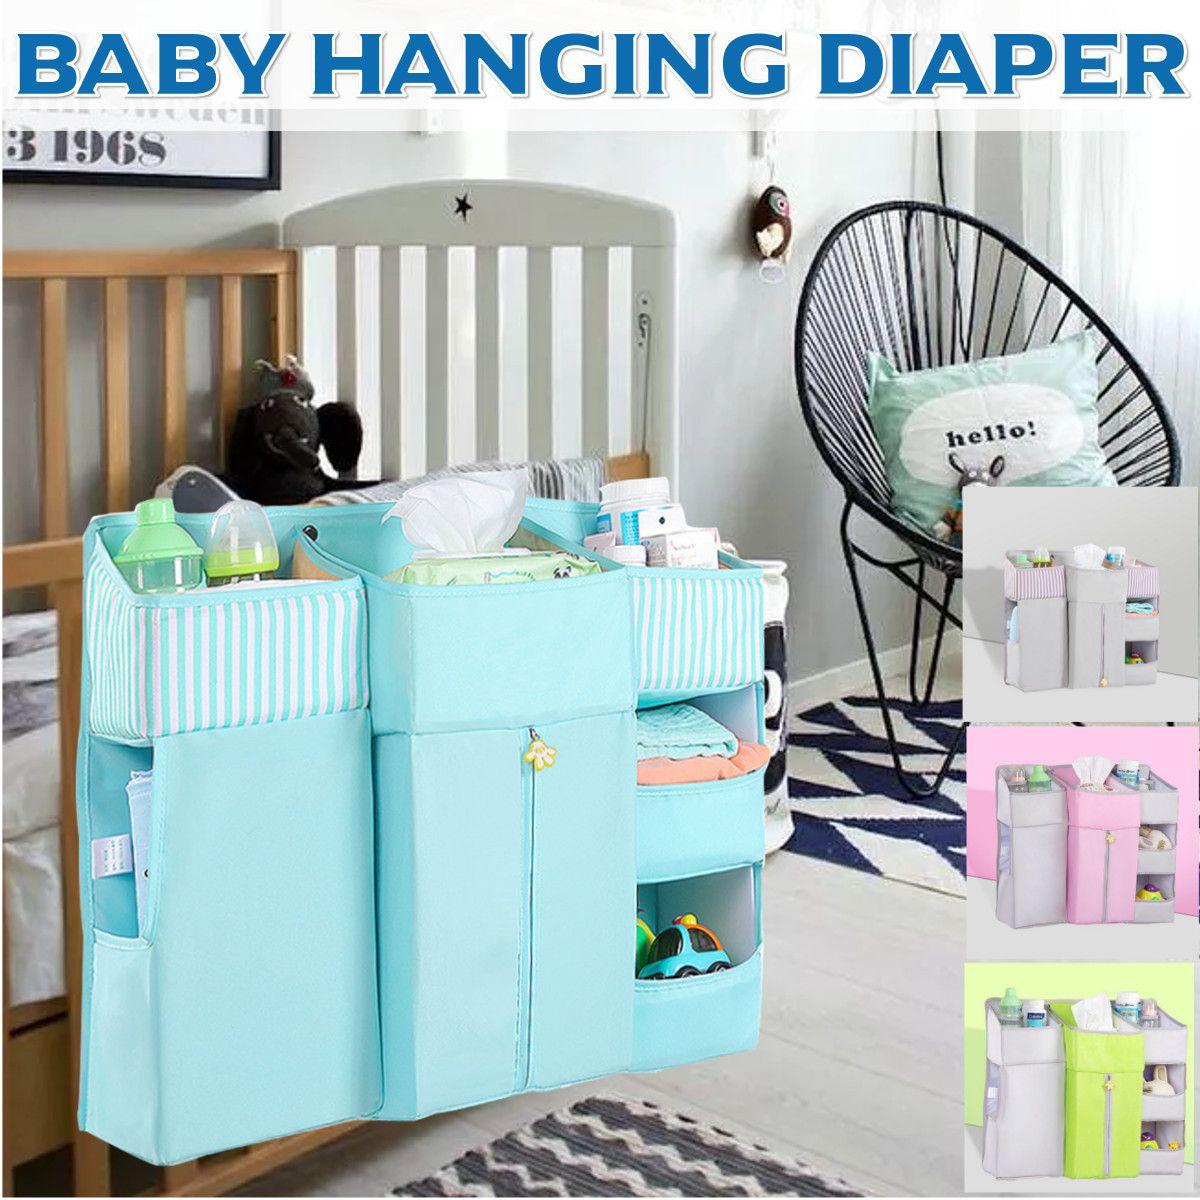 Portable Baby Crib Organizer Bed Hanging Bag For Baby Essentials Diaper Storage Cradle Bag Crib Bedding Set Bedside Diaper Caddy